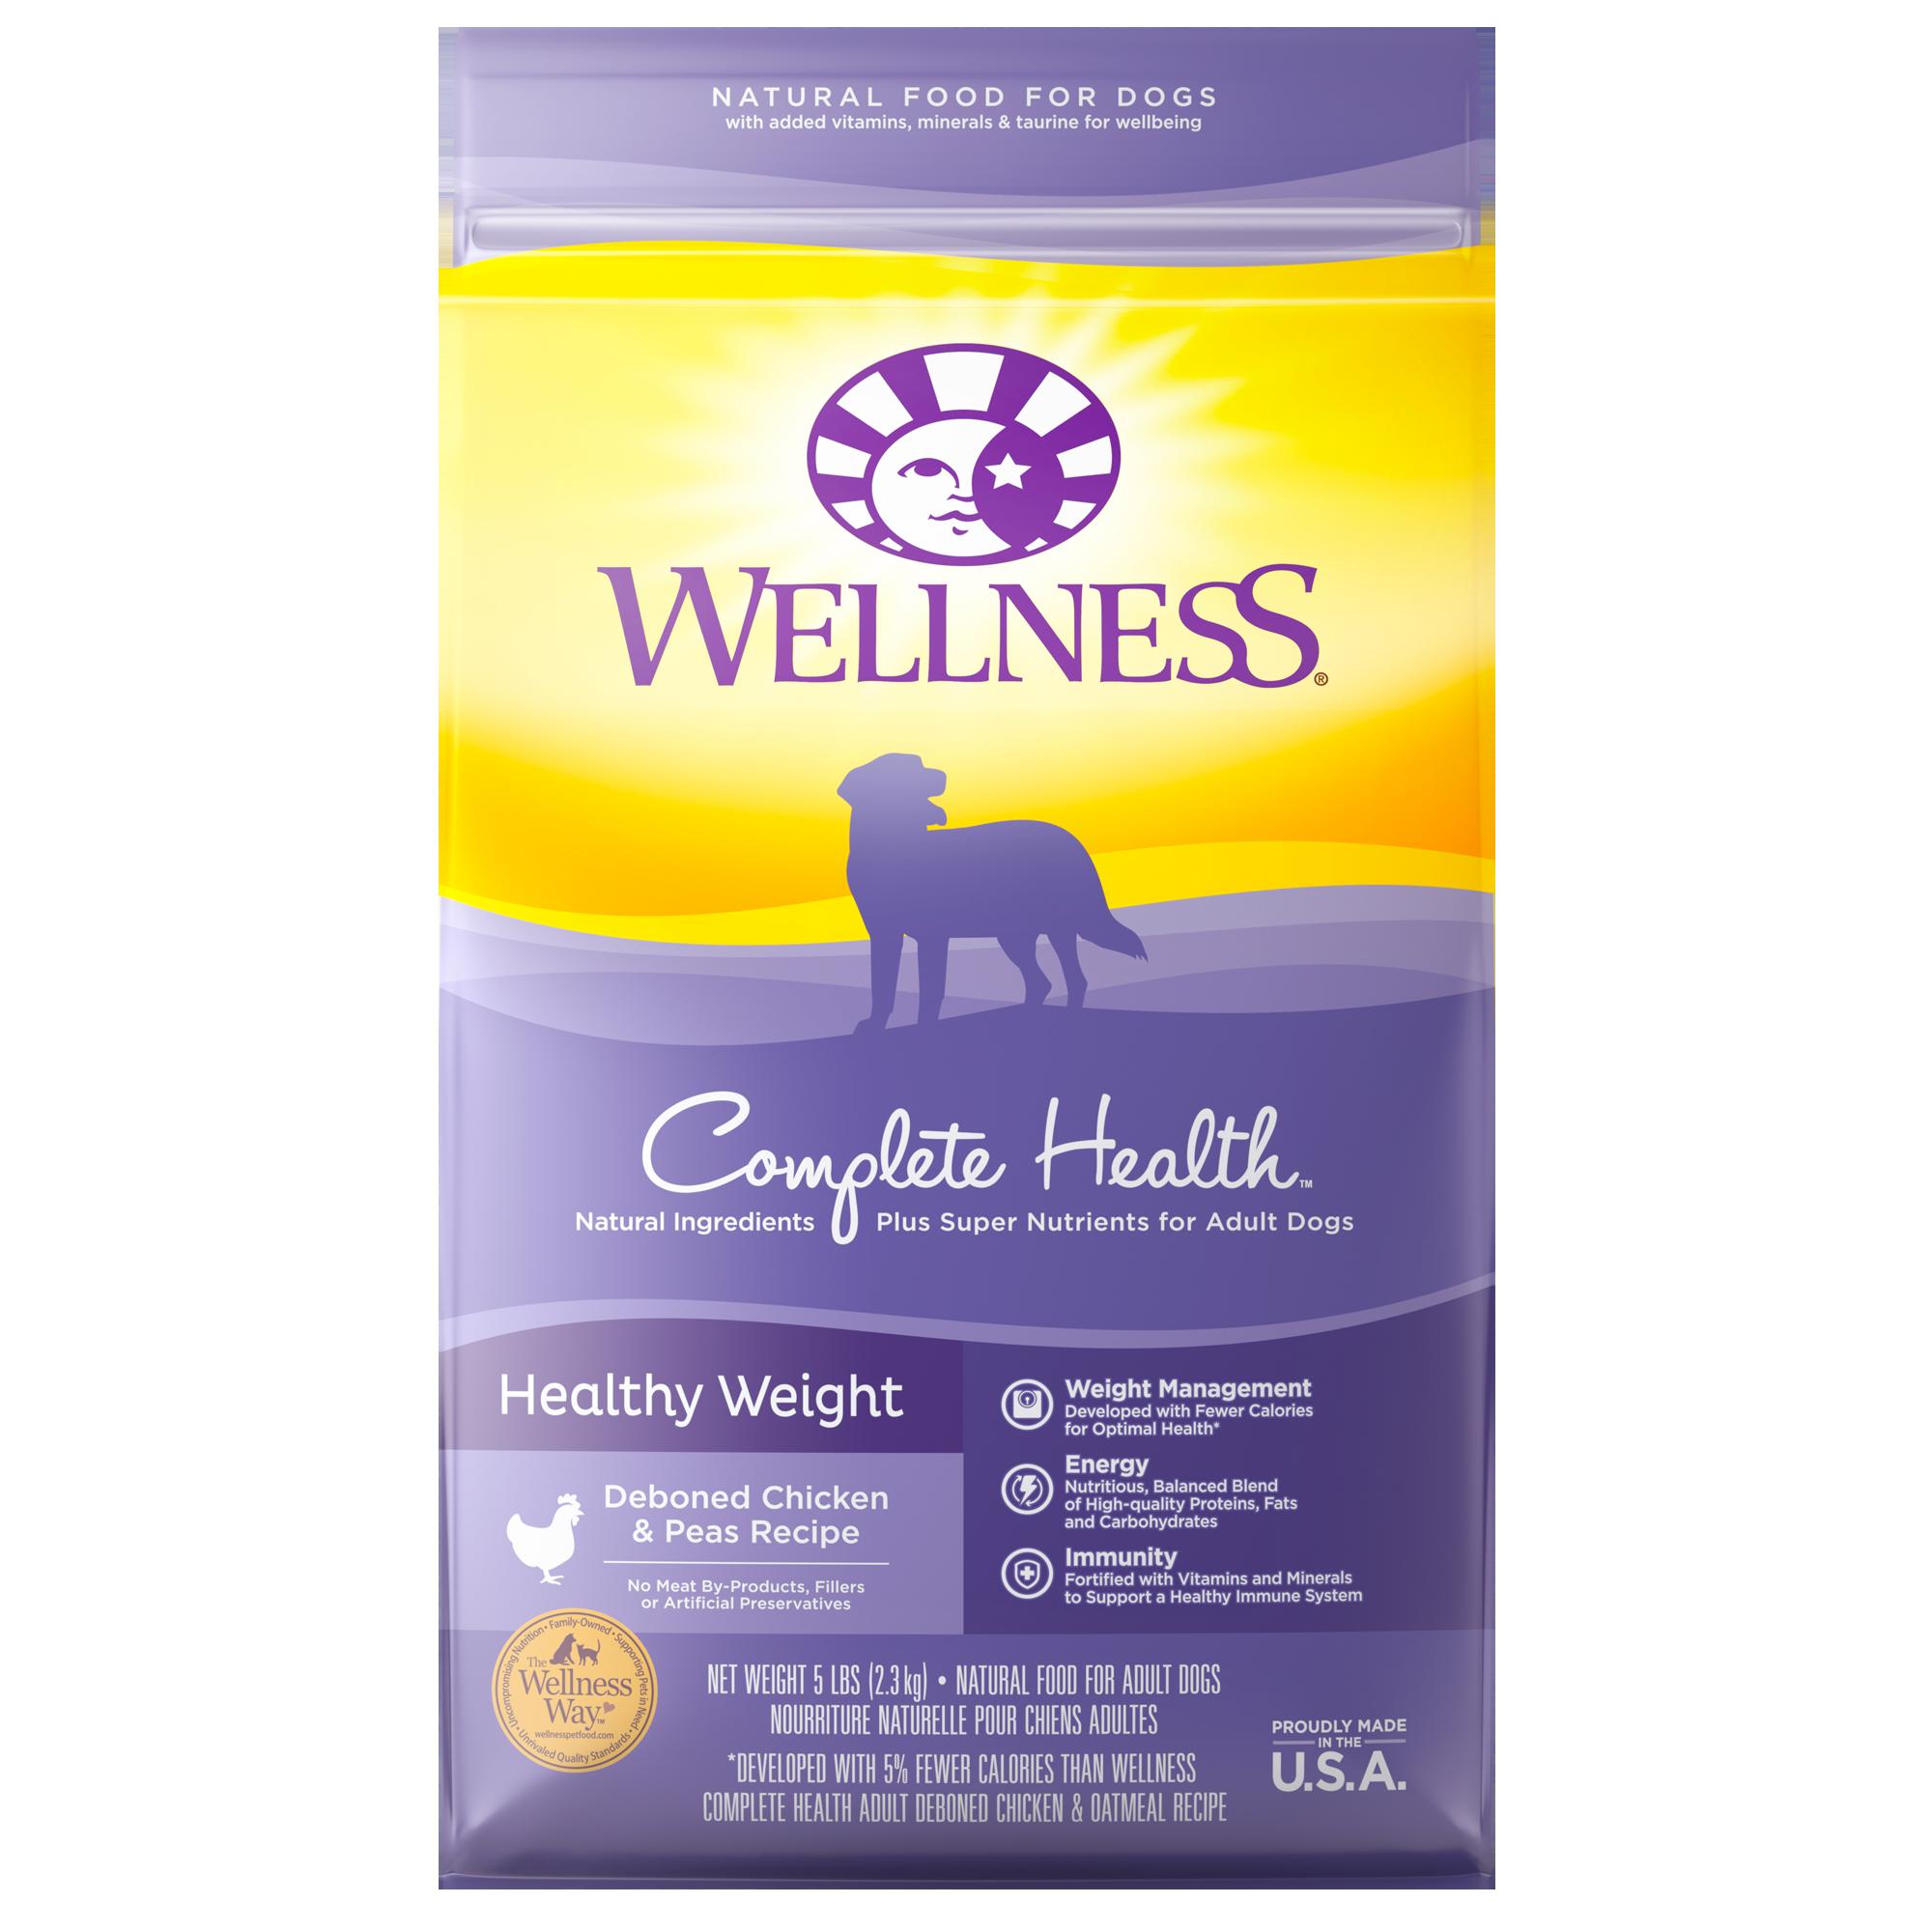 Wellness Complete Health Healthy Weight Deboned Chicken & Peas Recipe Dry Dog Food, 5-lb